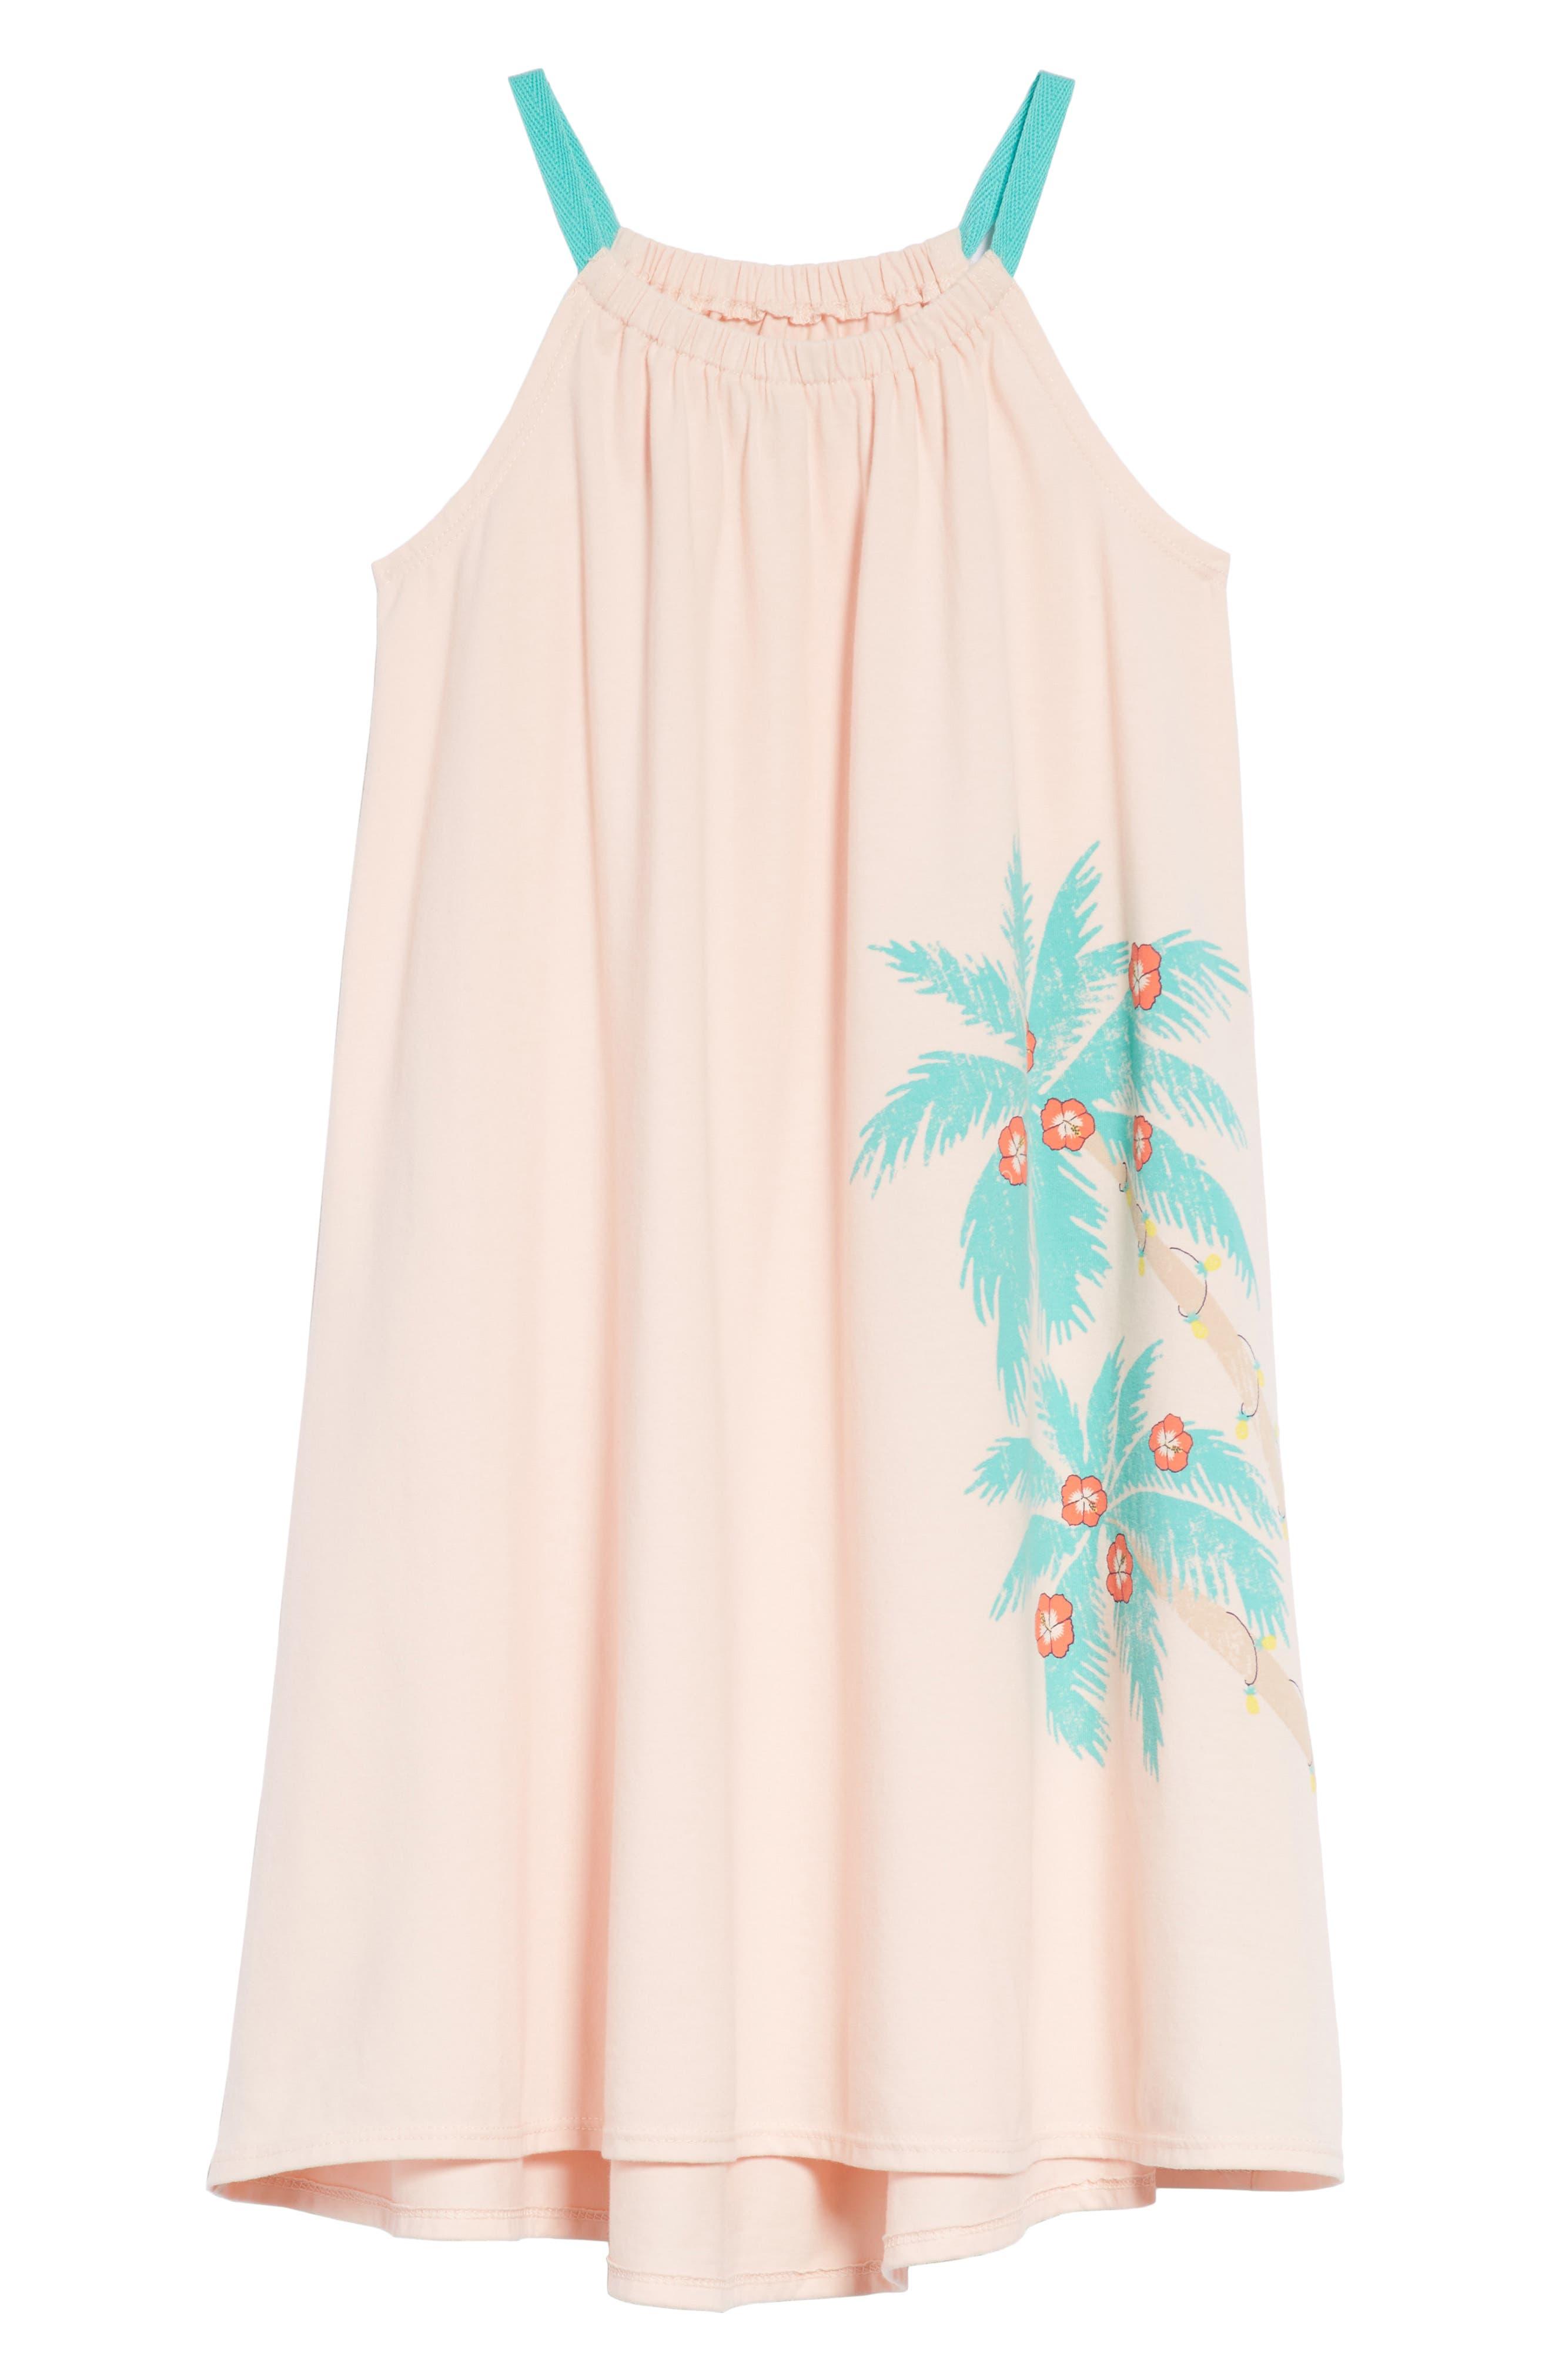 Tucker + Tate Palm Trees Graphic Swing Dress (Toddler Girls, Little Girls & Big Girls)